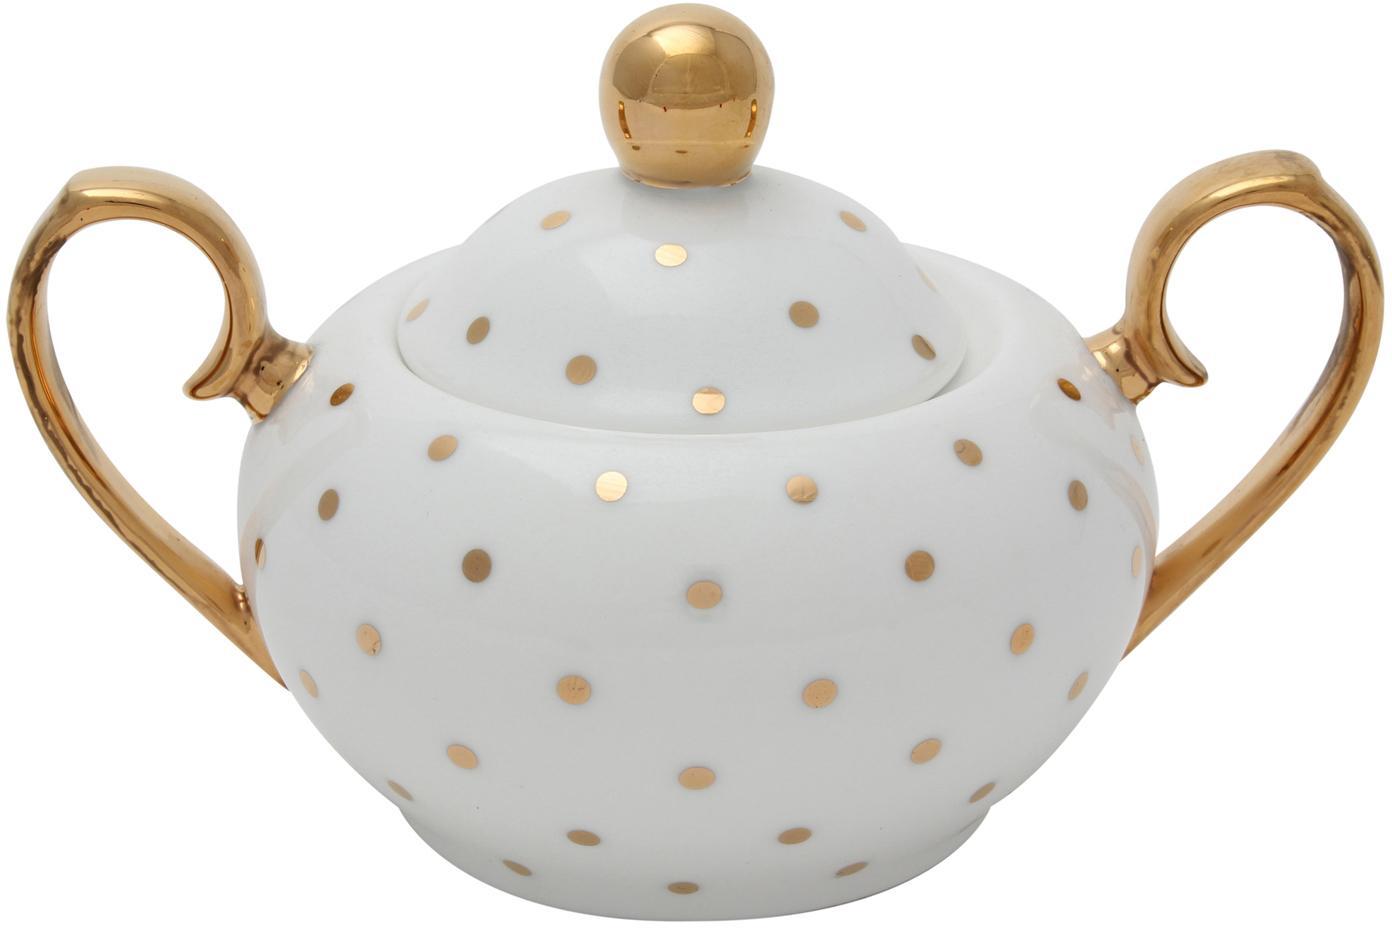 Zuckerdose Miss Golightly, Bone China, vergoldet, Weiss, Gold, Ø 9 x H 8 cm